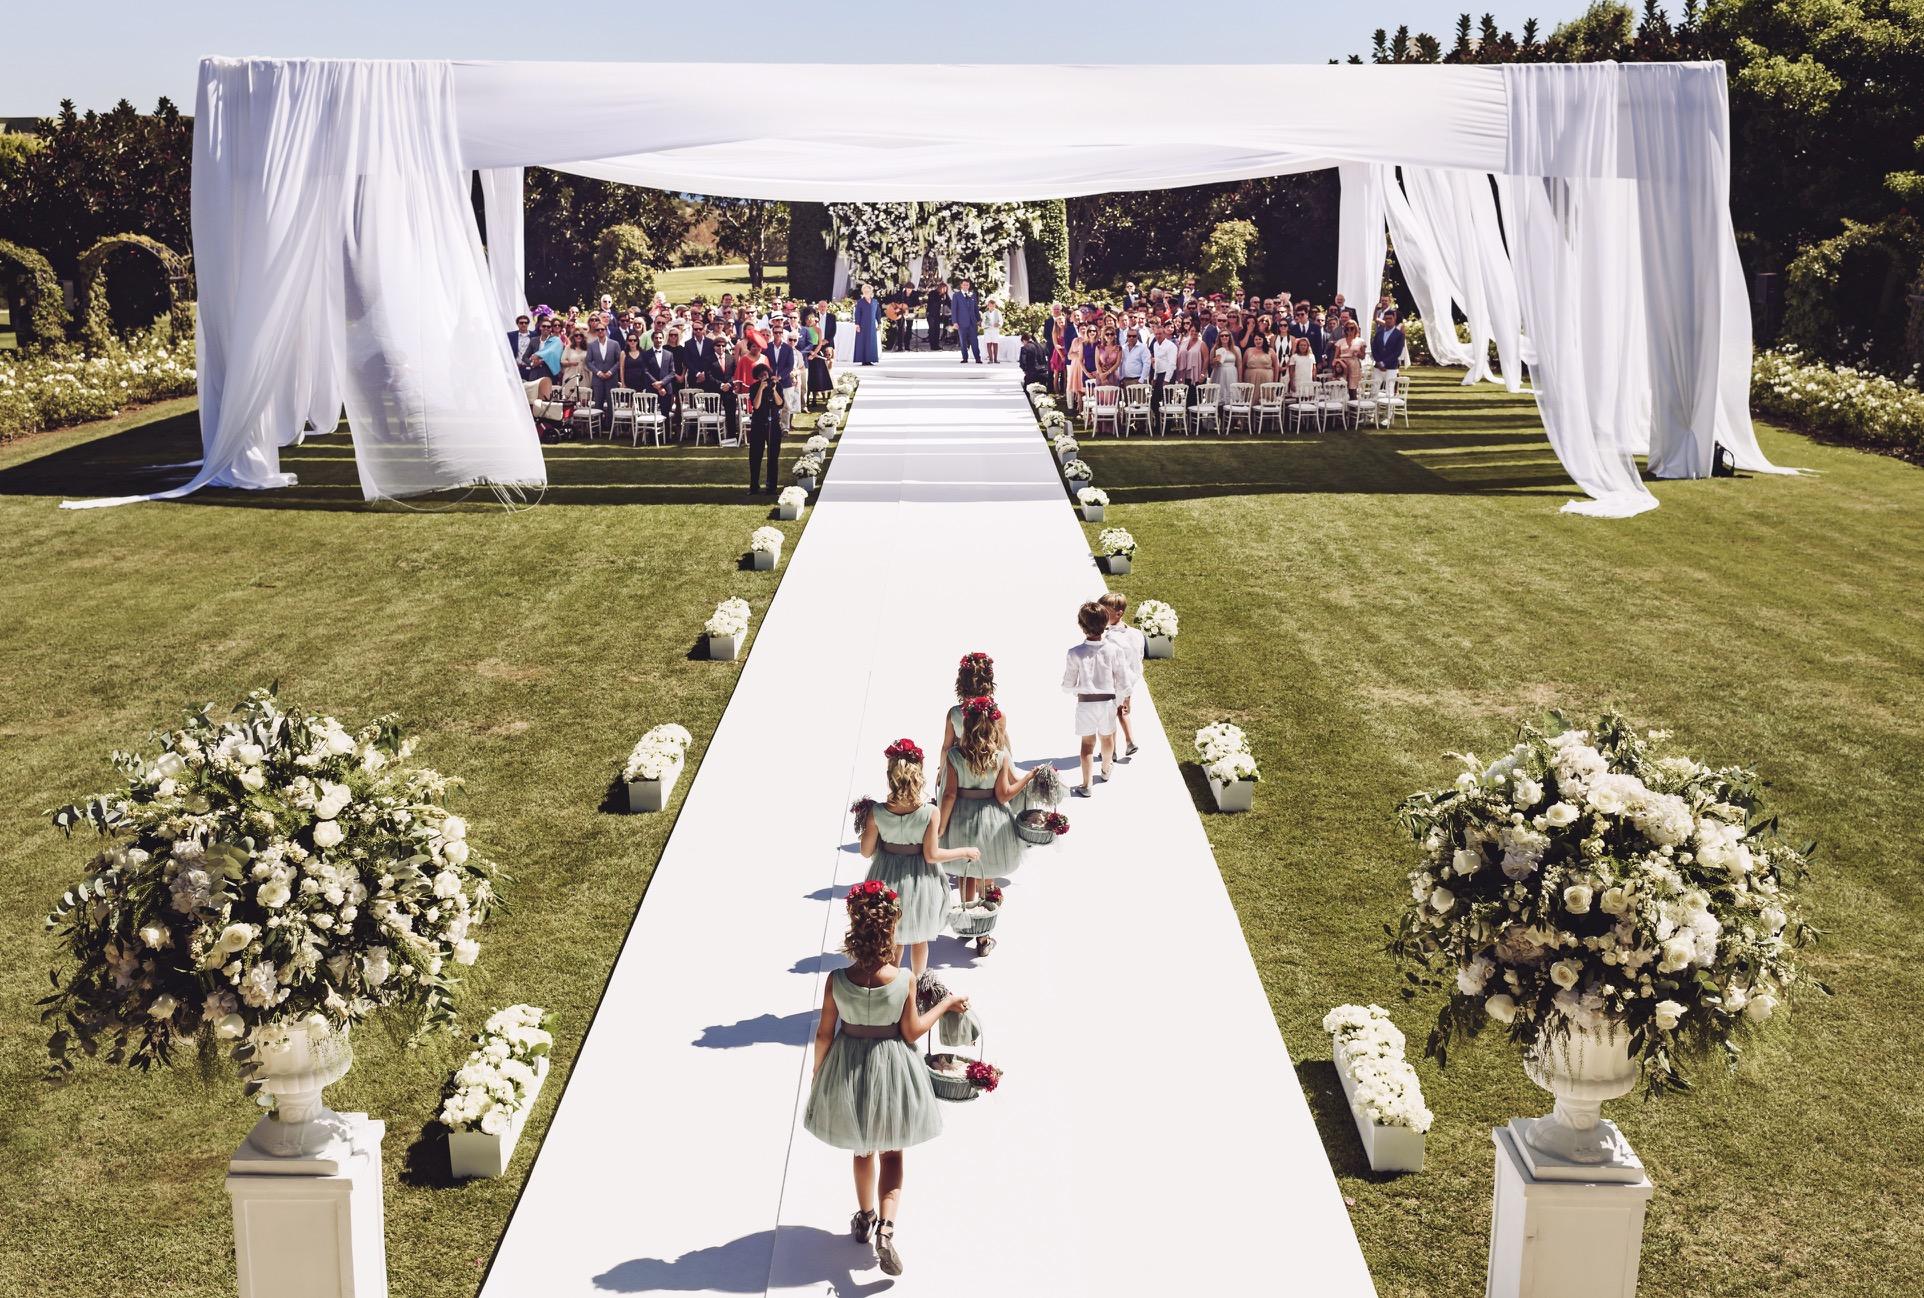 Si-Quiero-Wedding-Planner-By-Sira-Antequera-Bodas-Málaga-Marbella-Miami- Michelle-Walter-1